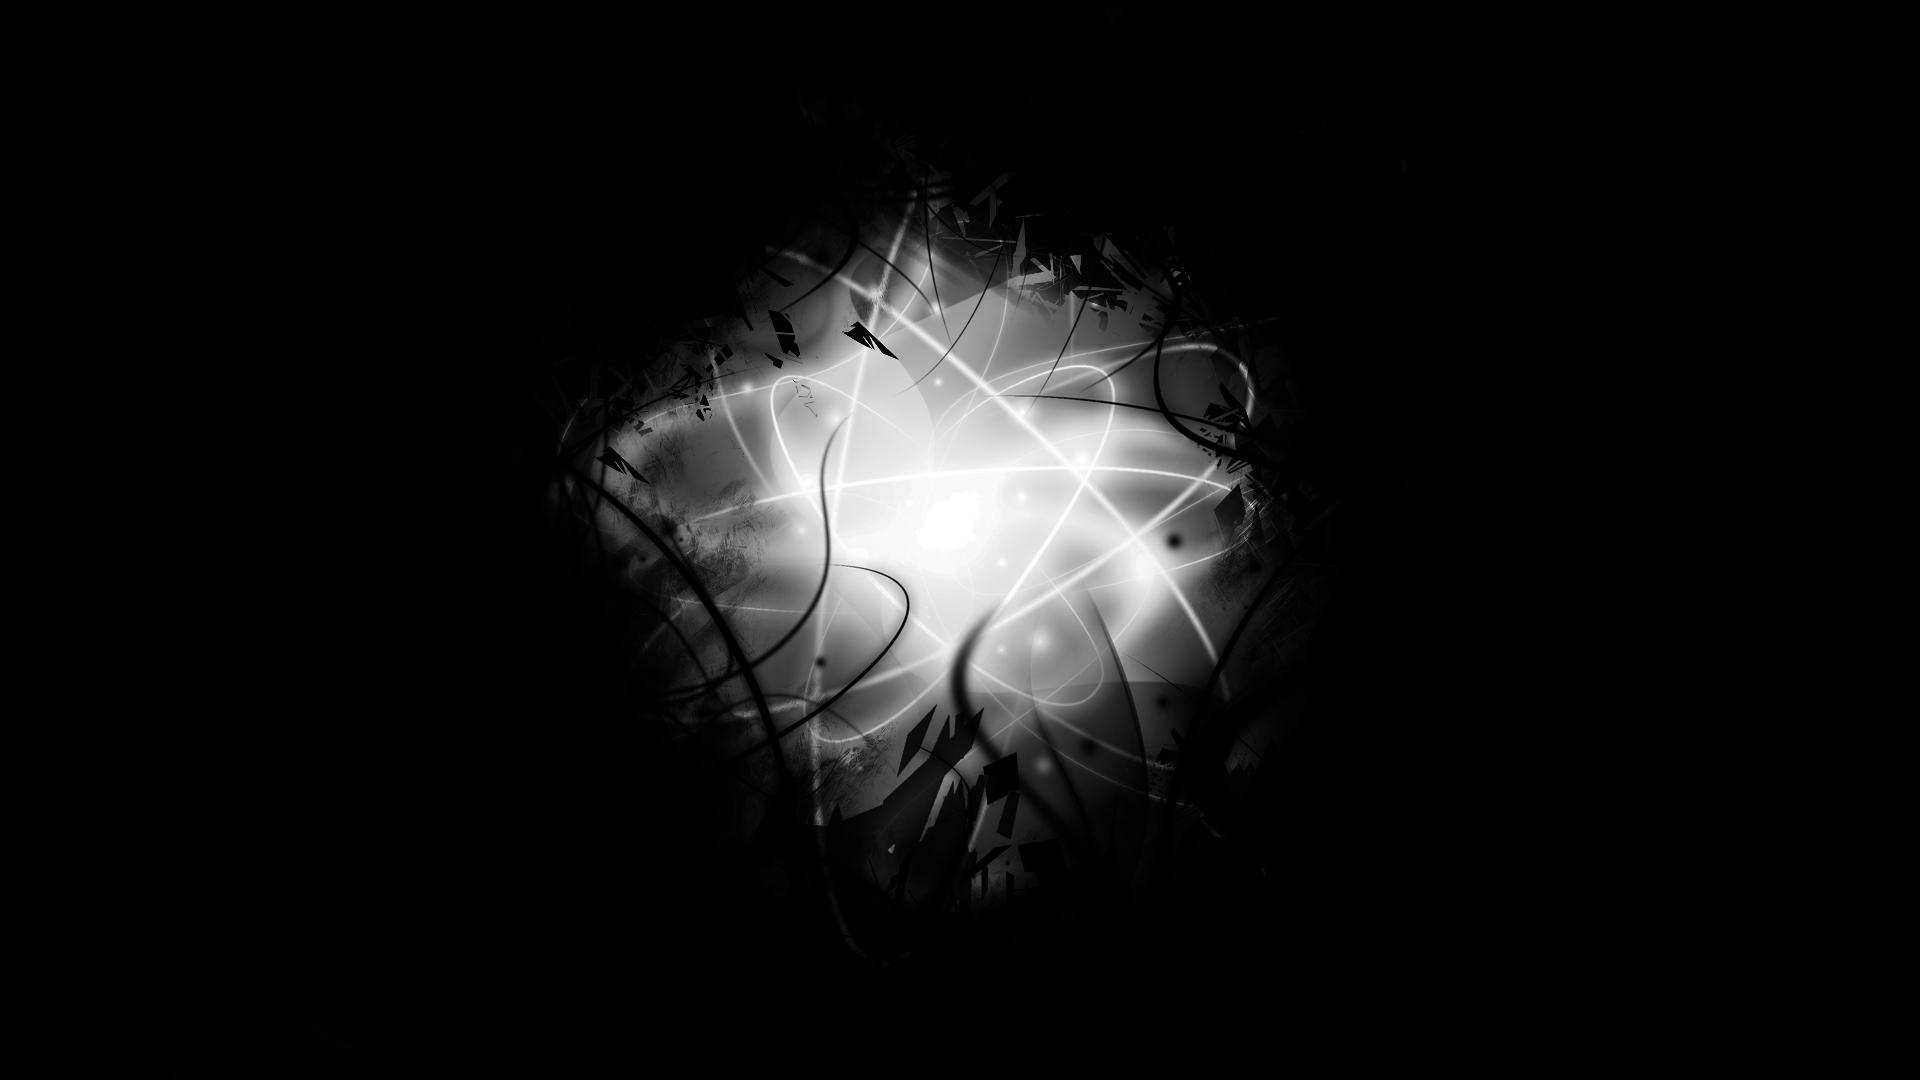 darkness wallpaper by corgon67 on deviantart